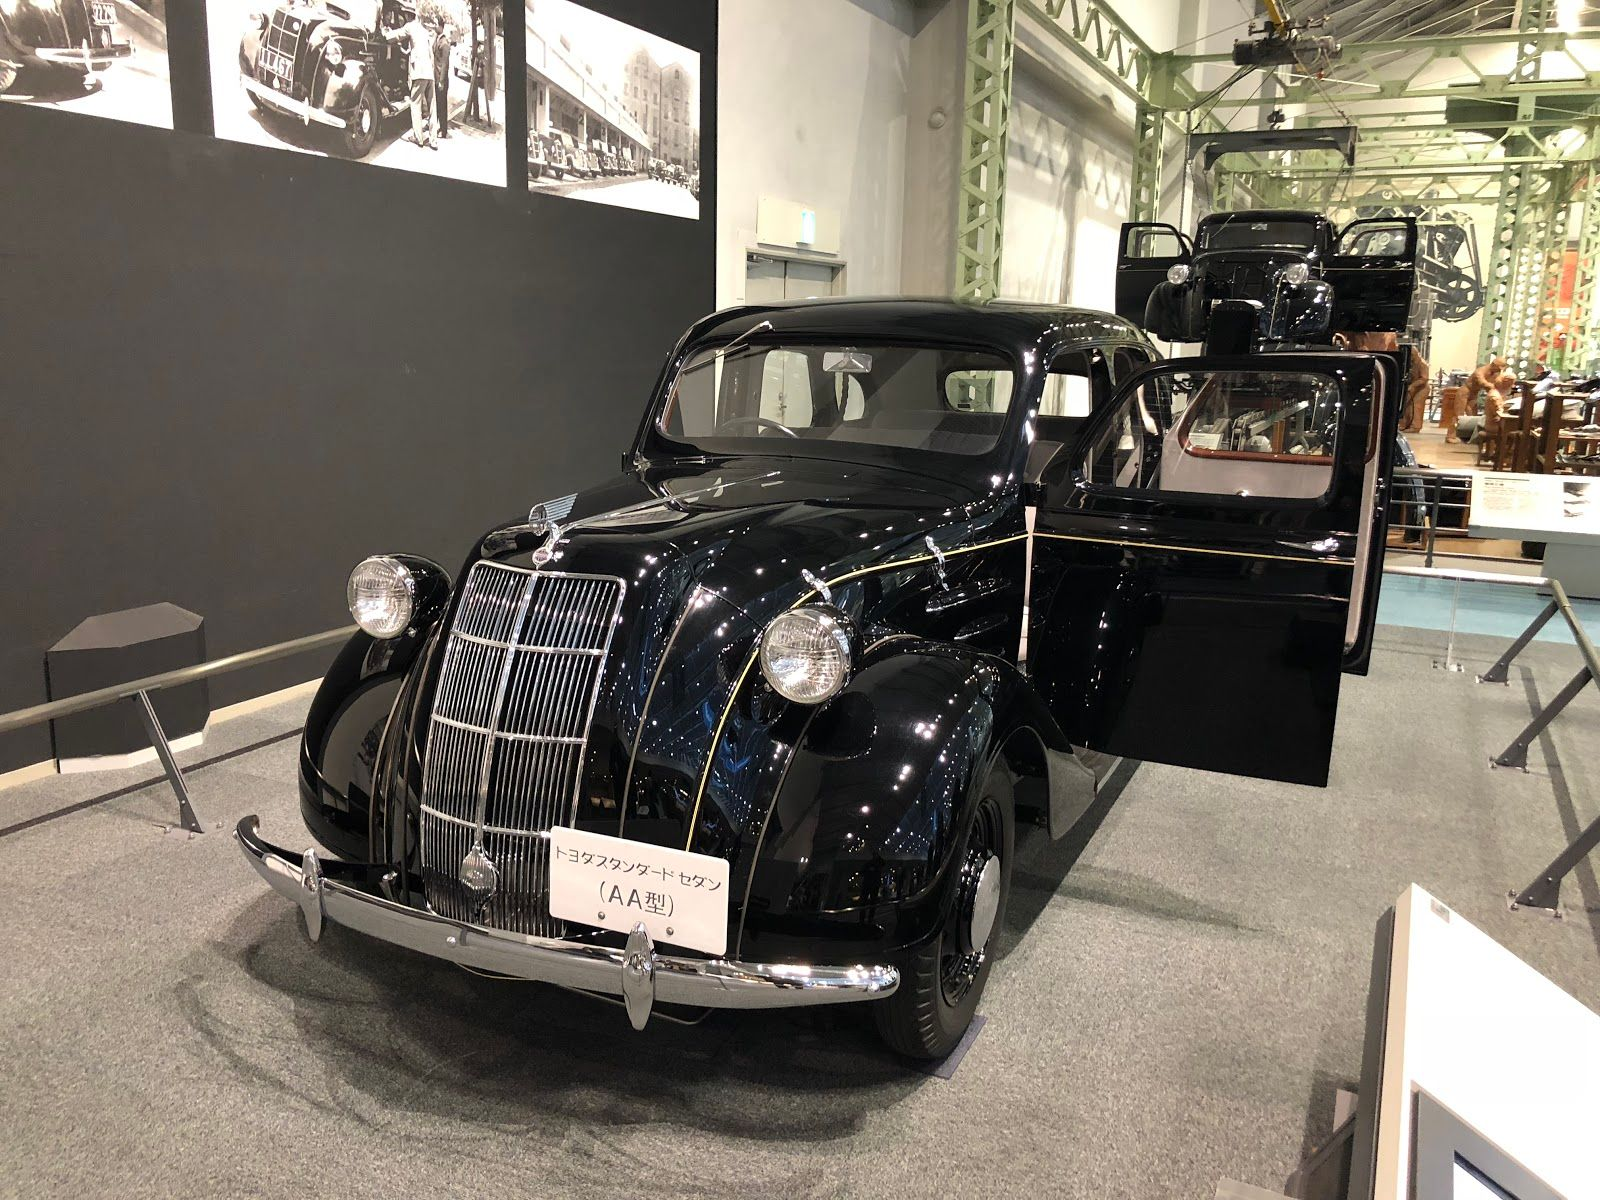 AA car